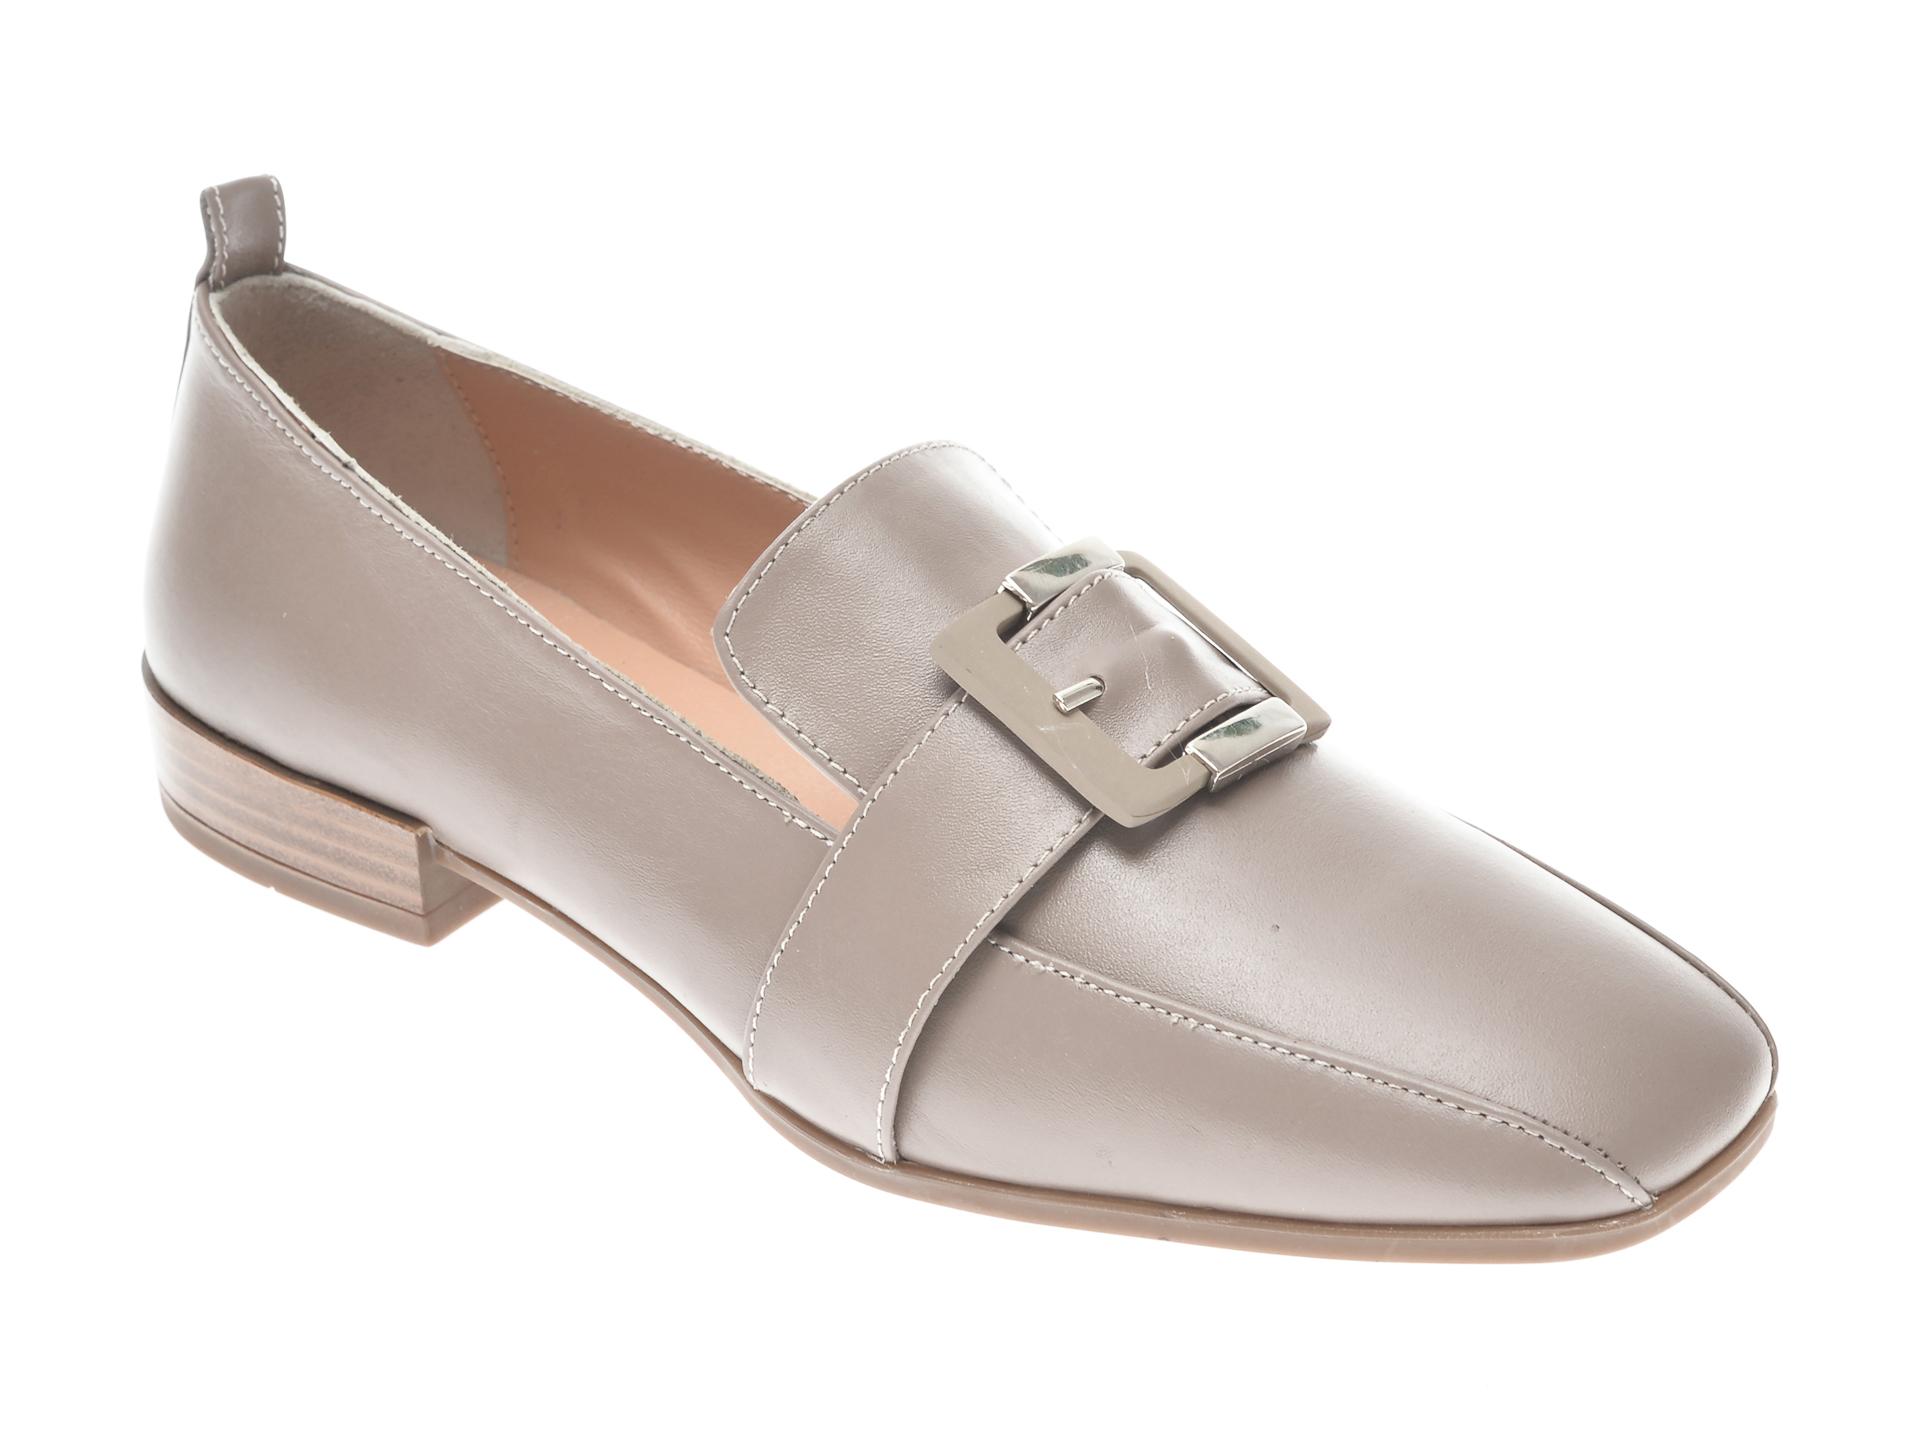 Pantofi Flavia Passini Gri, 22209, Din Piele Naturala